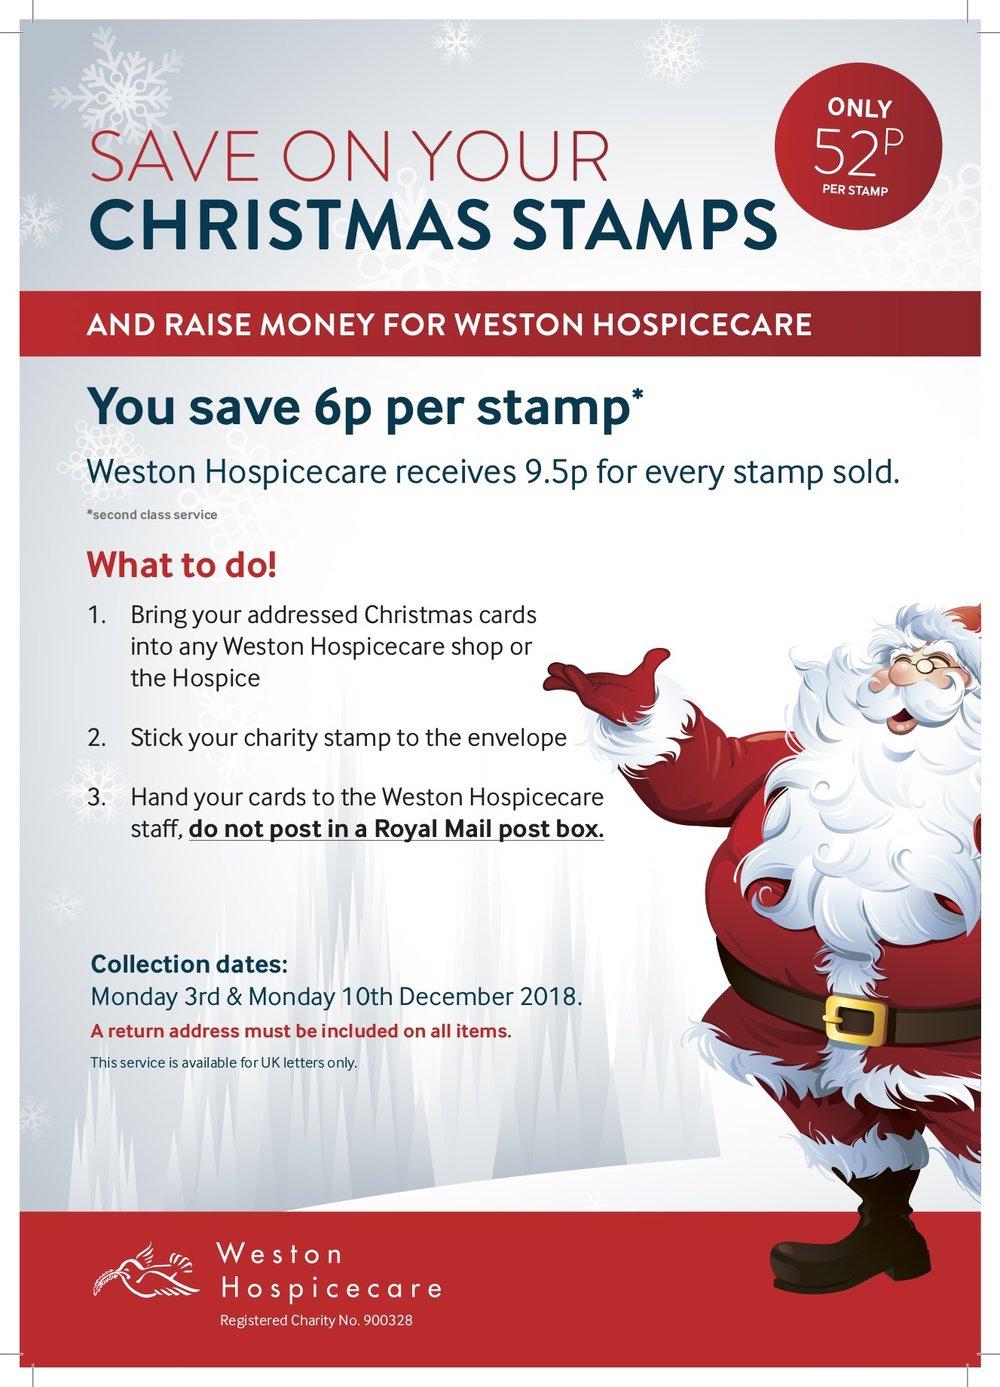 OP Christmas Stamps Western 2018 HR - A4 Poster - Print.jpg